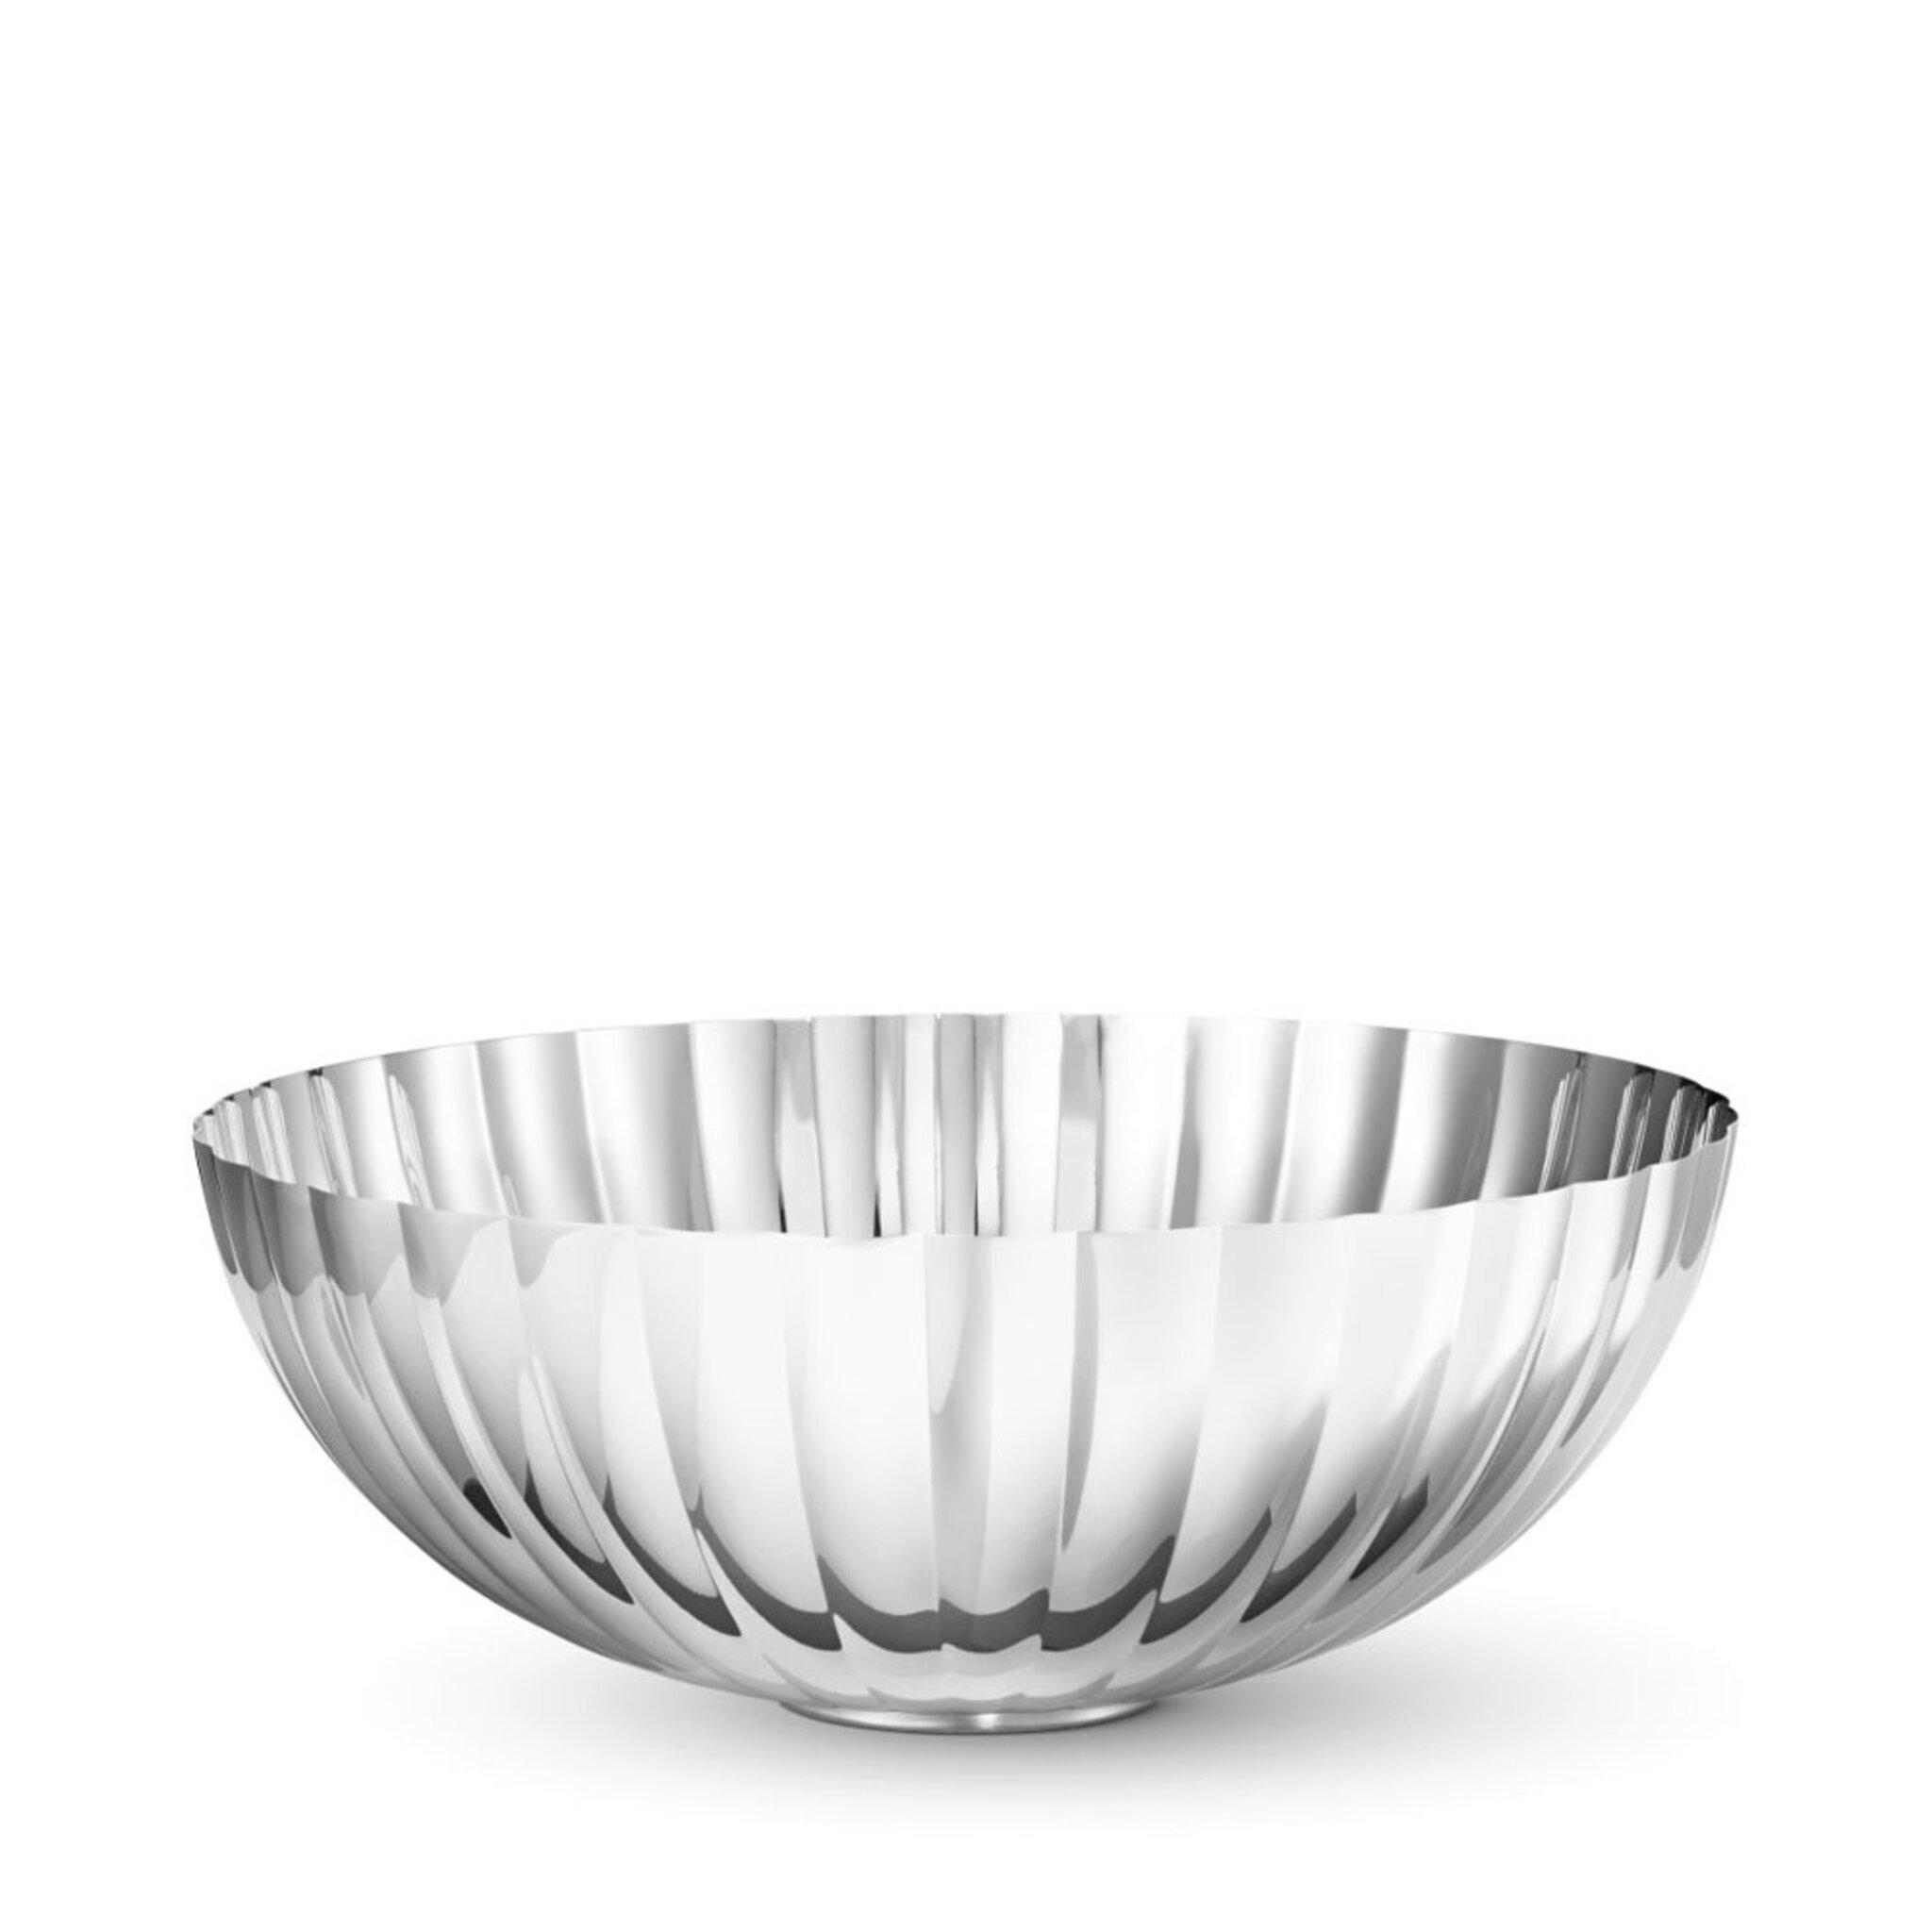 Skål Bernadotte Ø 26 cm